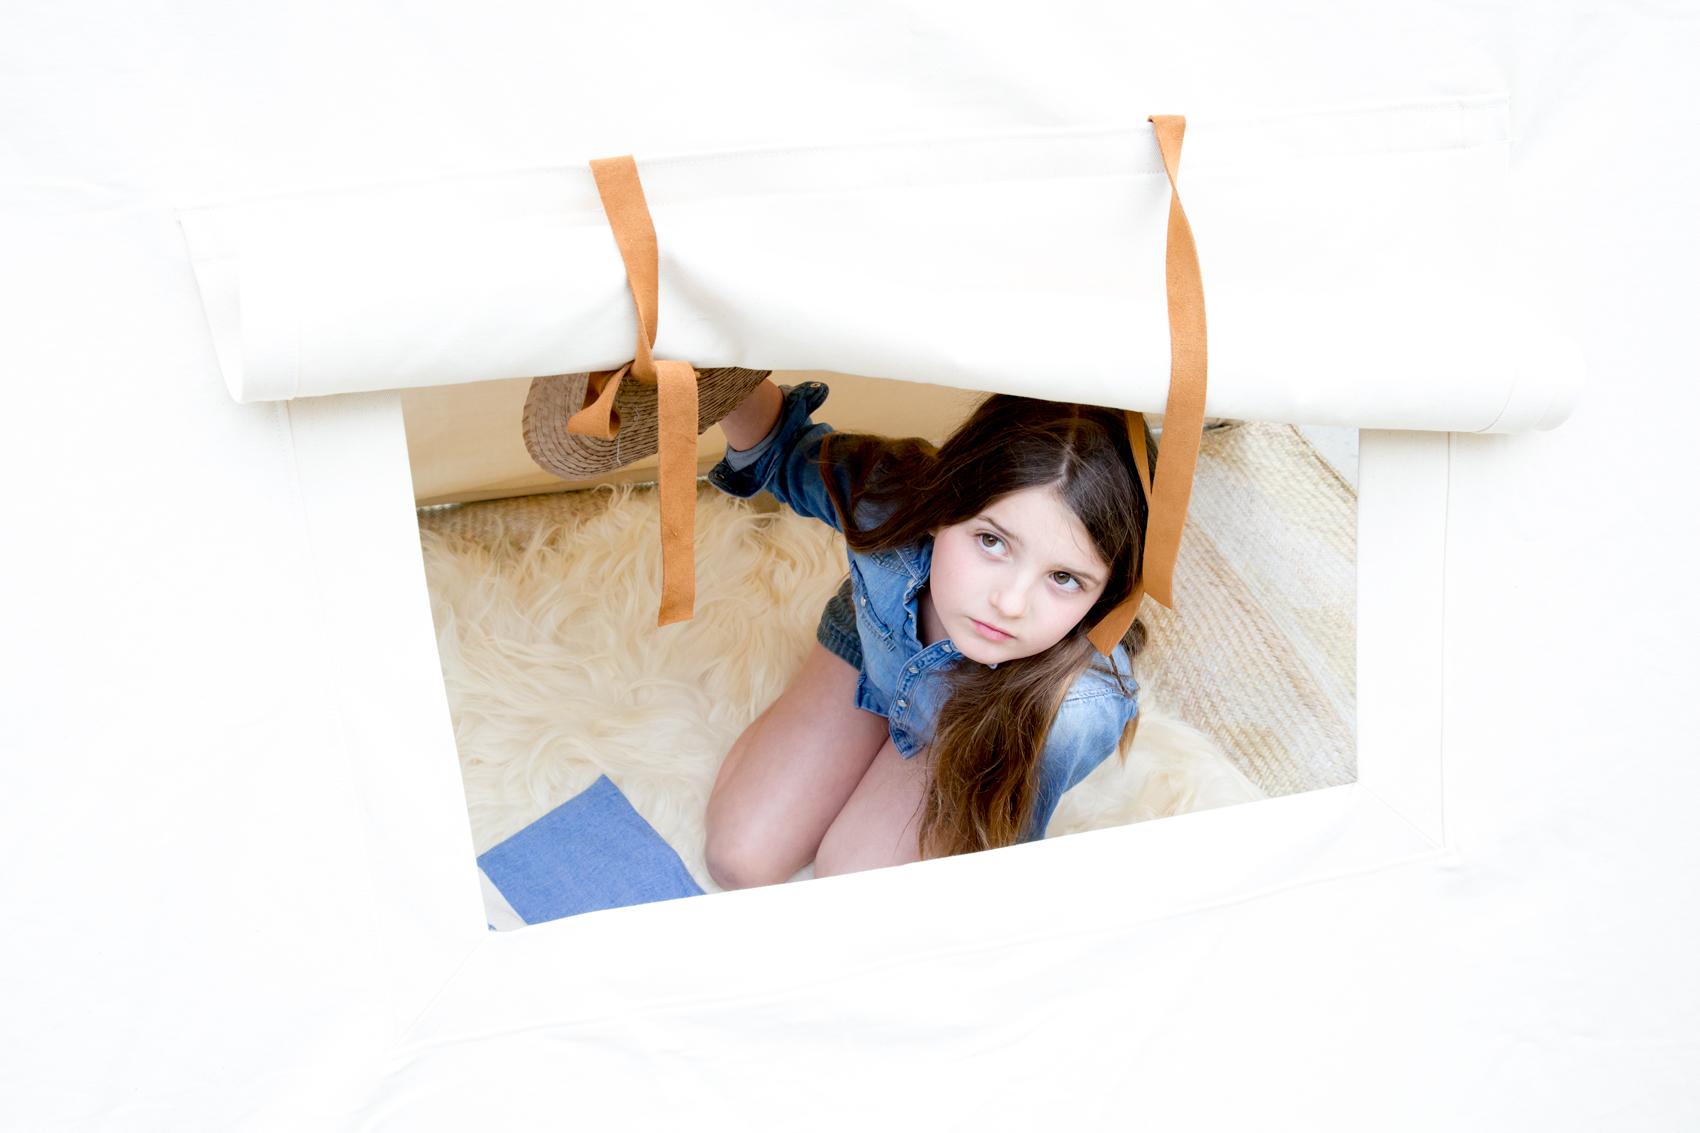 Field tent kids teepee in natural window detail